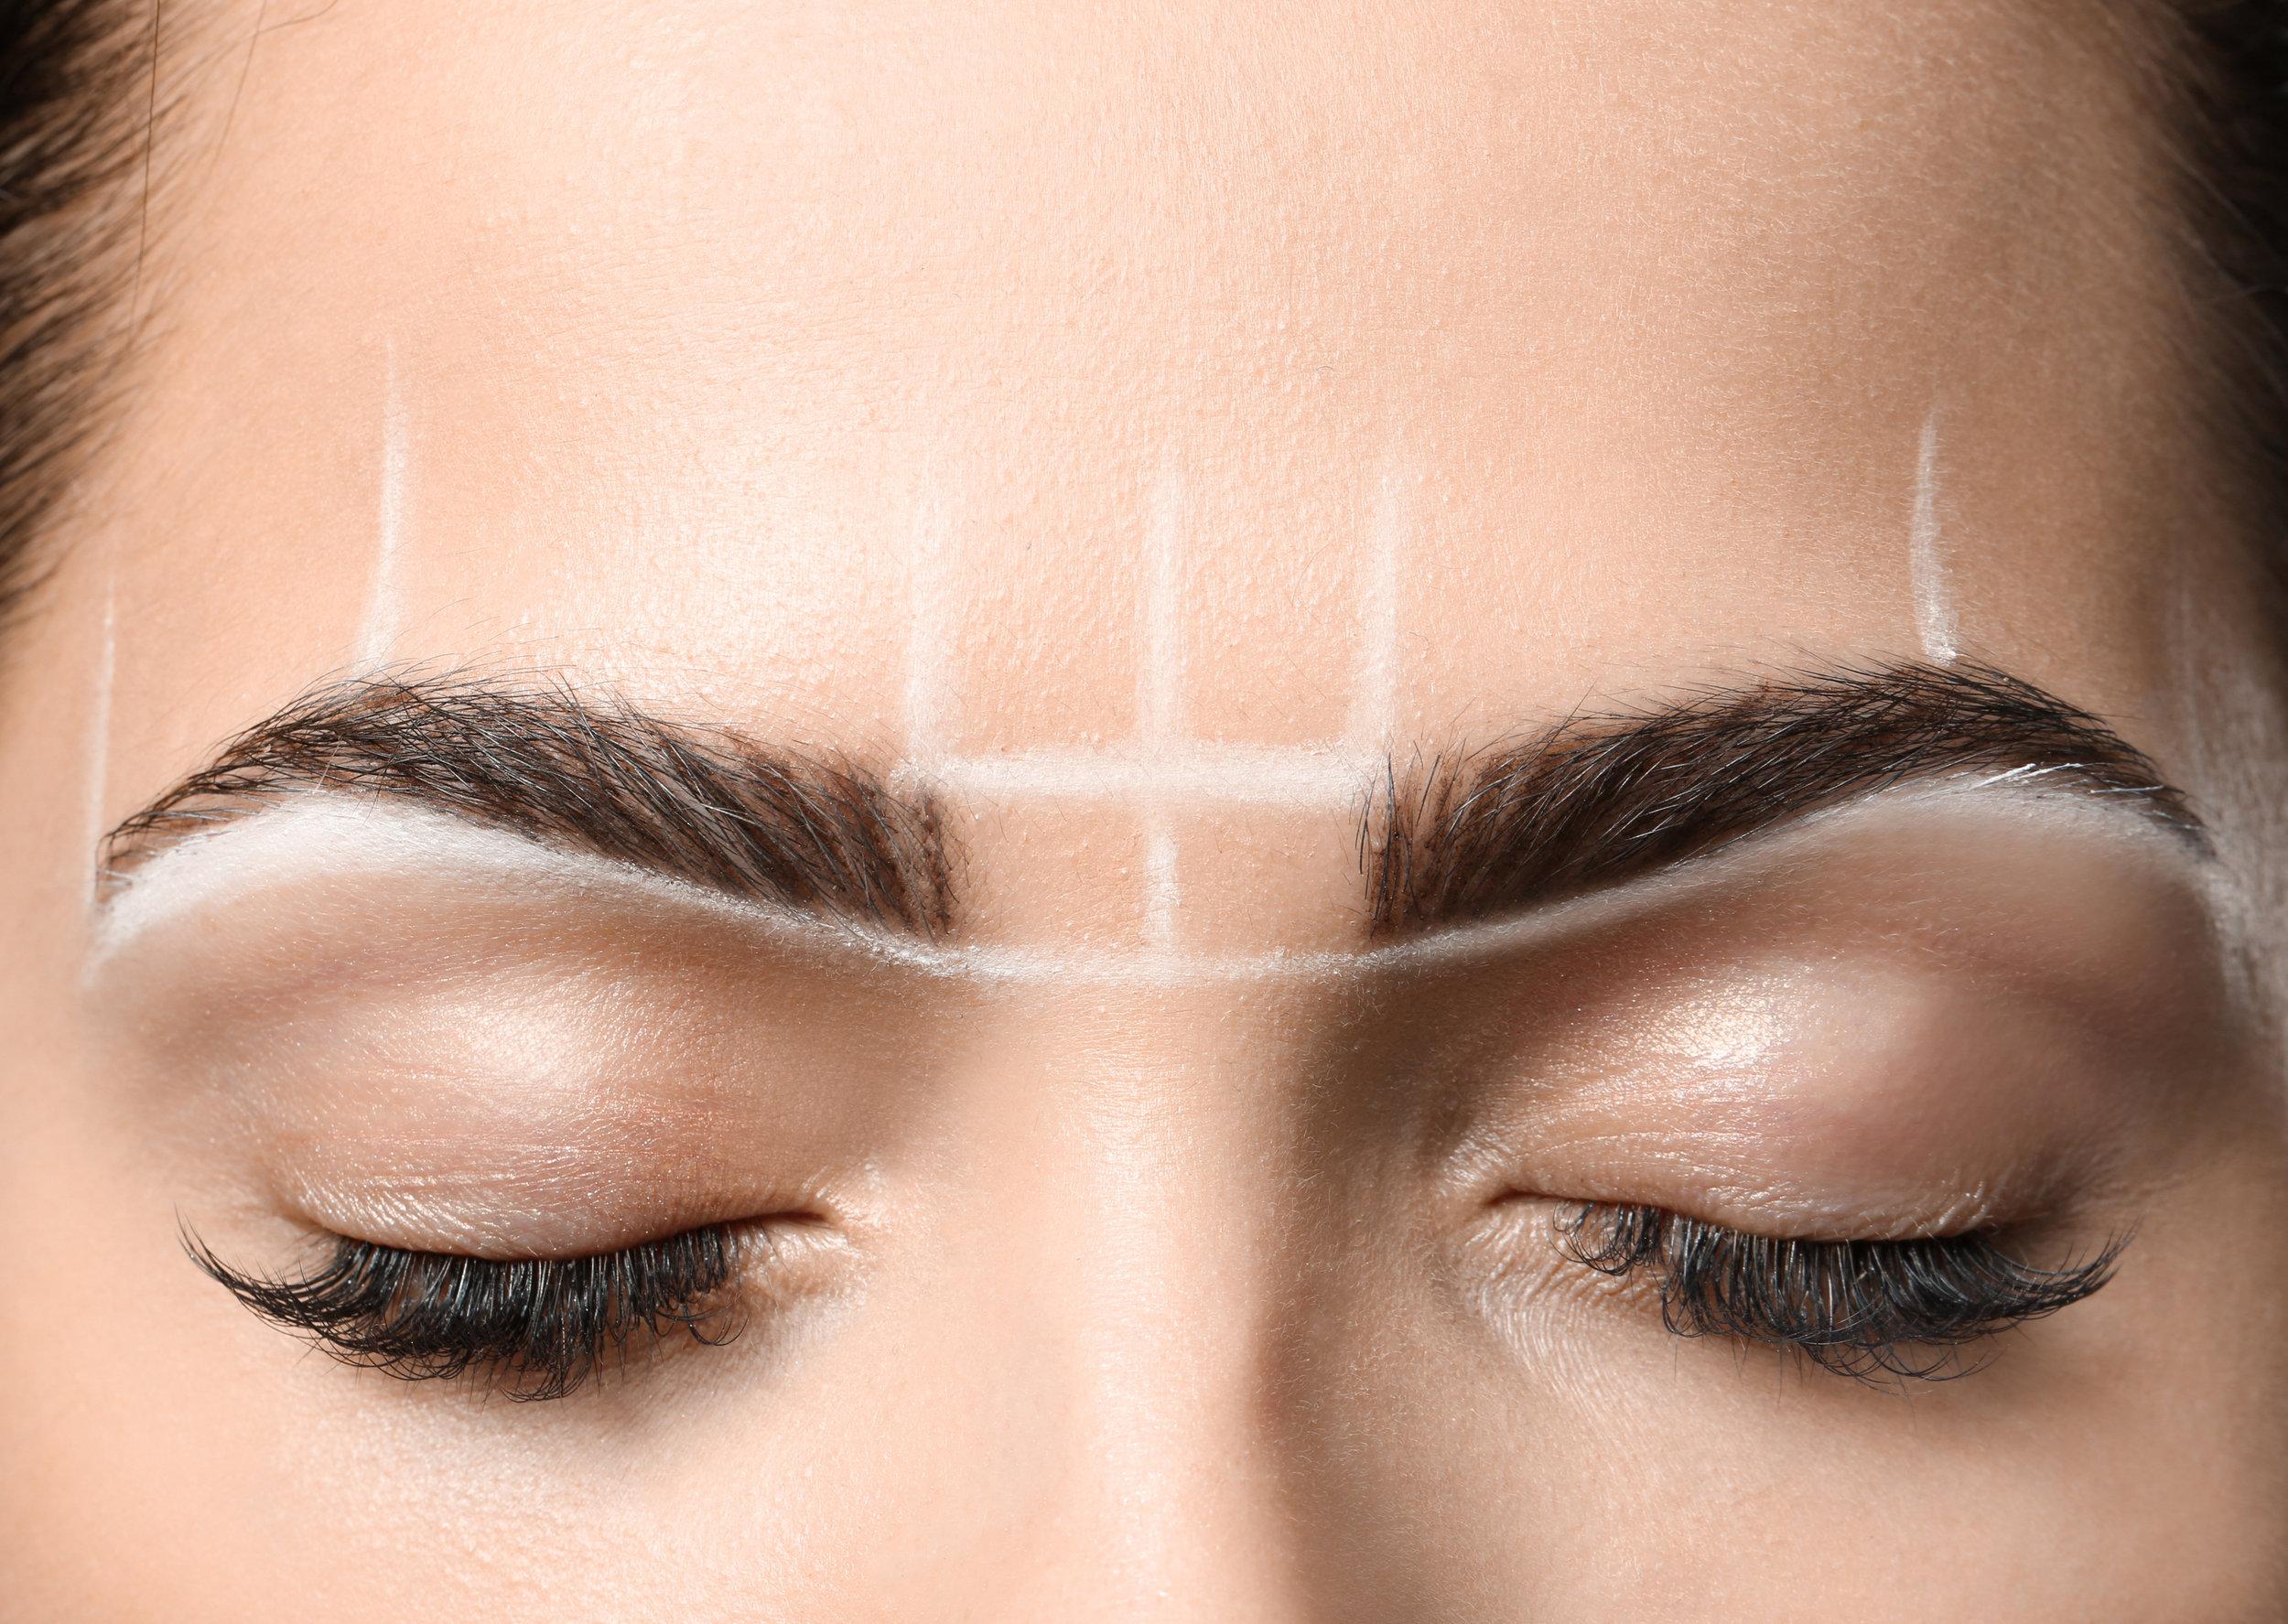 Microblading - creating beautiful, natural brows